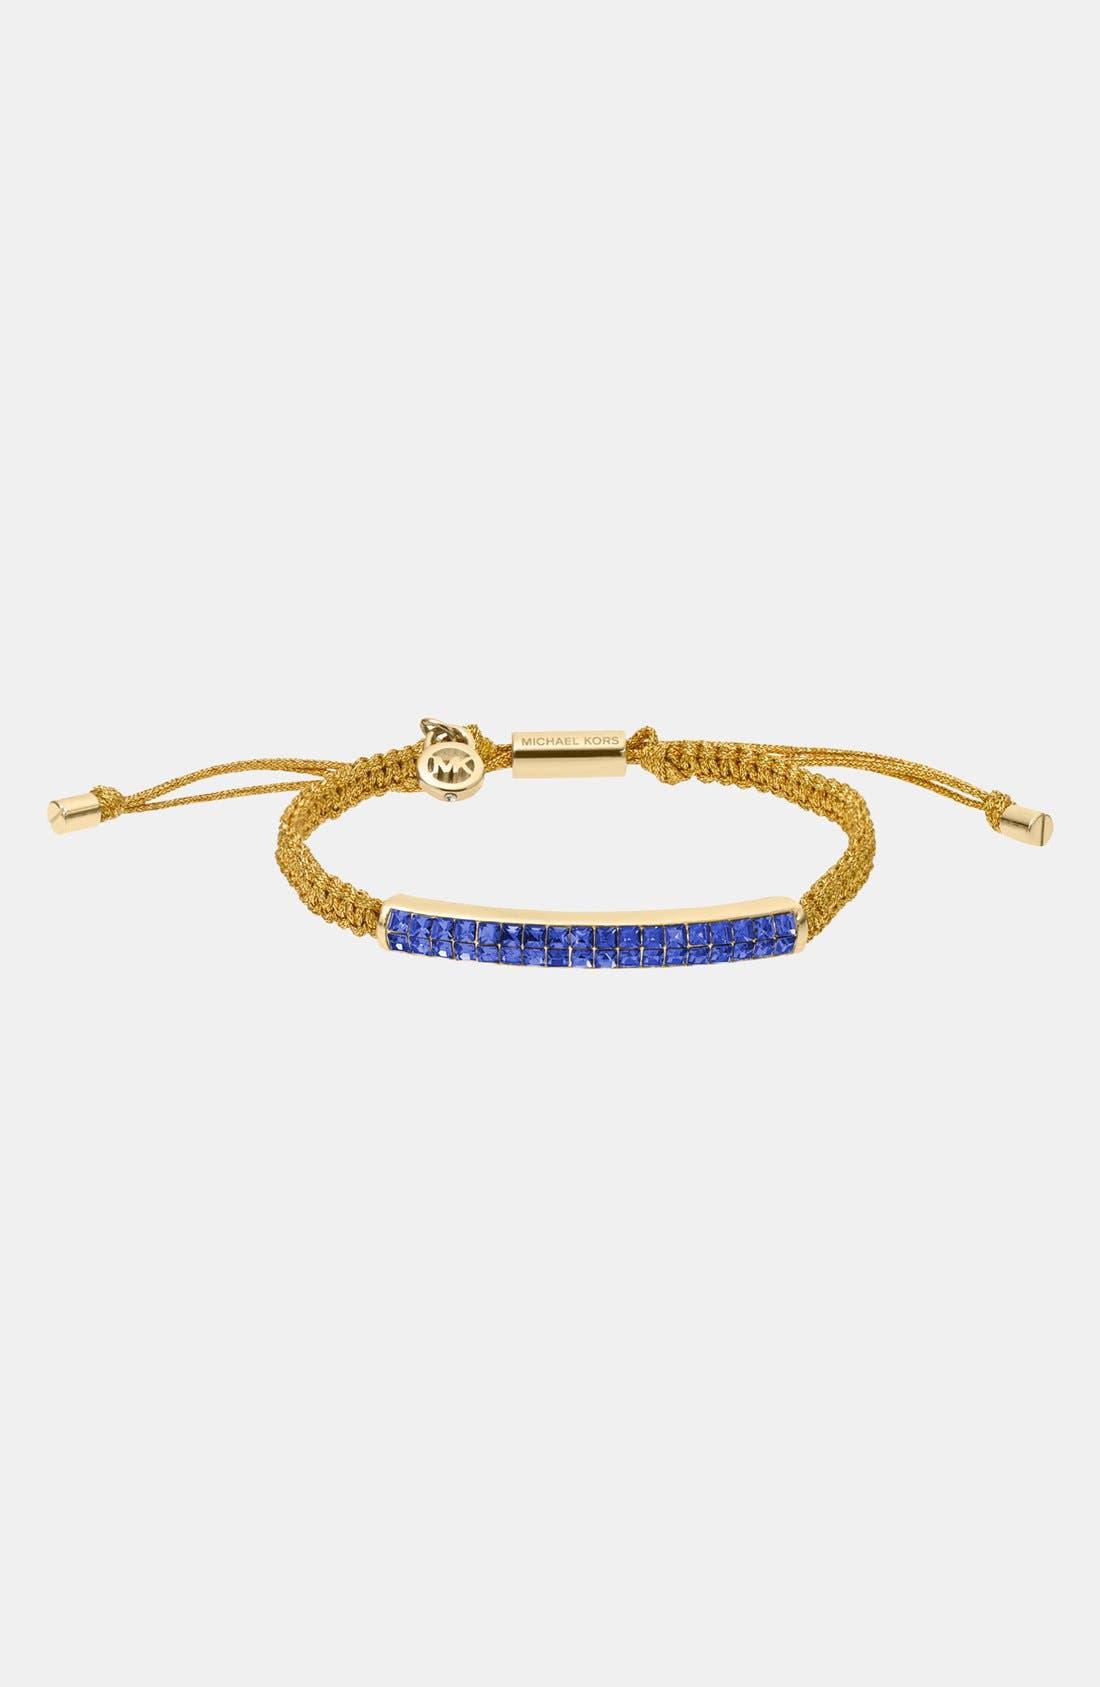 Alternate Image 1 Selected - Michael Kors 'Brilliance' Macramé Bracelet